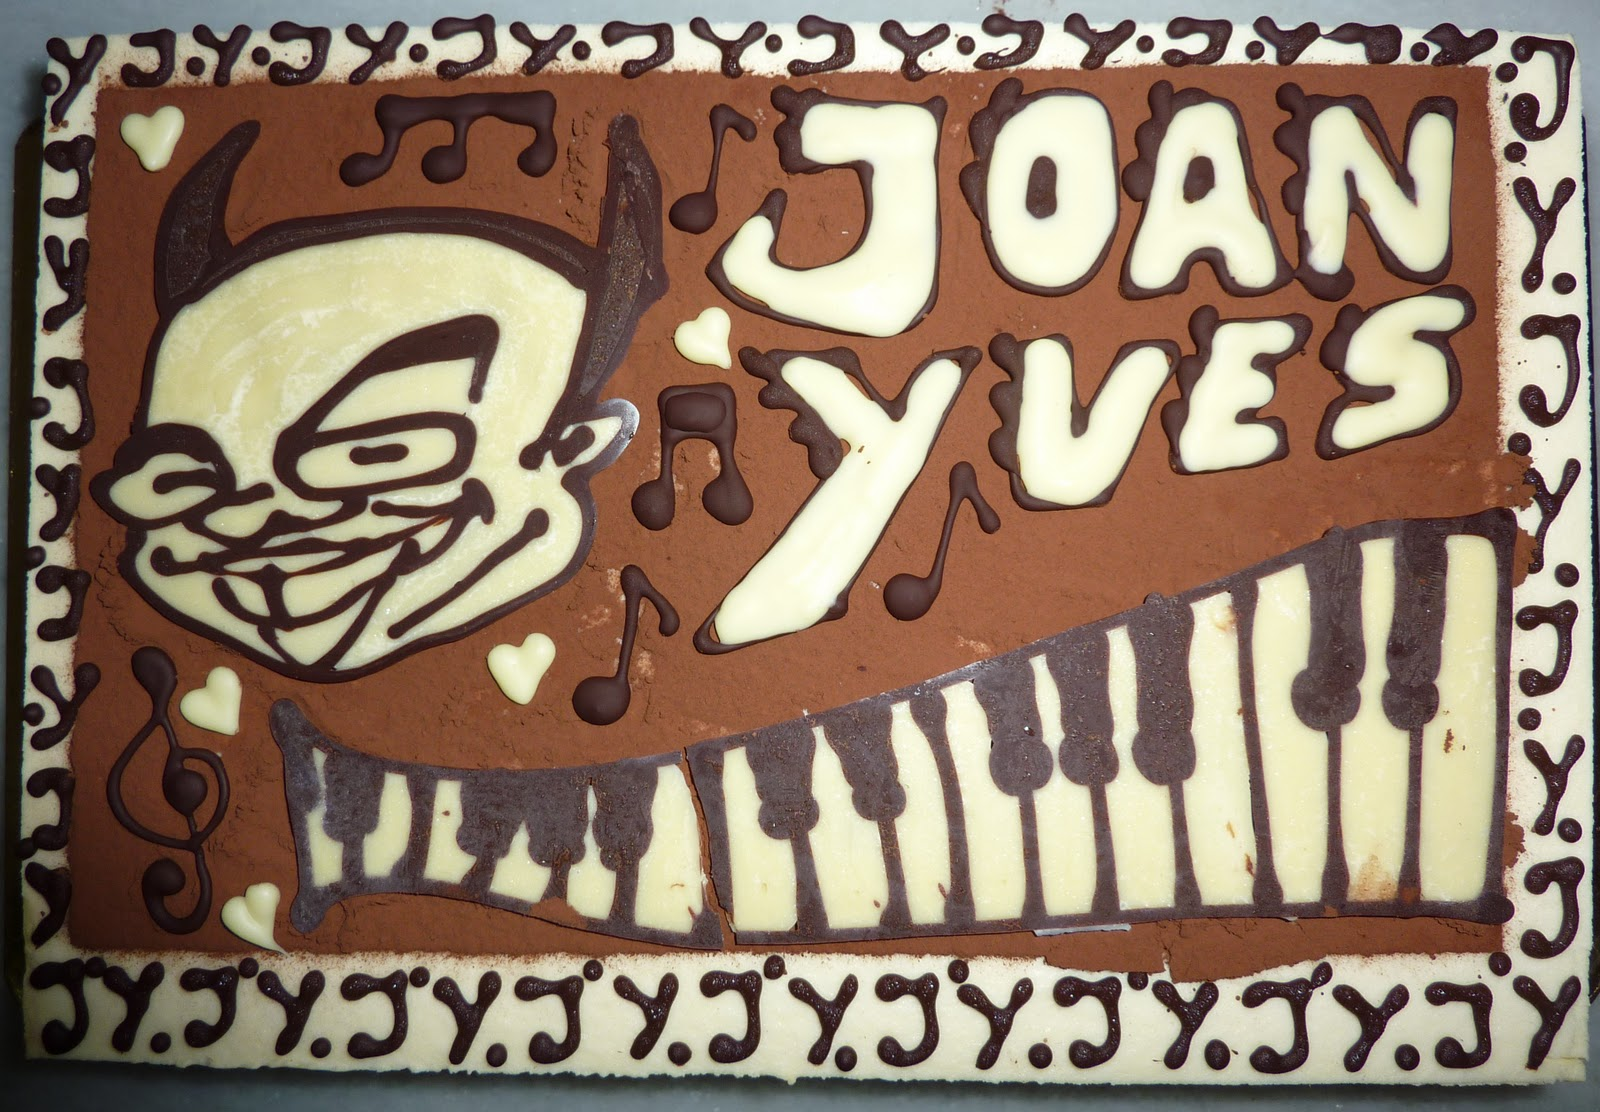 http://3.bp.blogspot.com/-BbIOHpM7fz0/Tp7Bi2NJyzI/AAAAAAAAAD0/vuejmrk0J6U/s1600/Retok+Feliz+Cumple+Joan-Yves.JPG